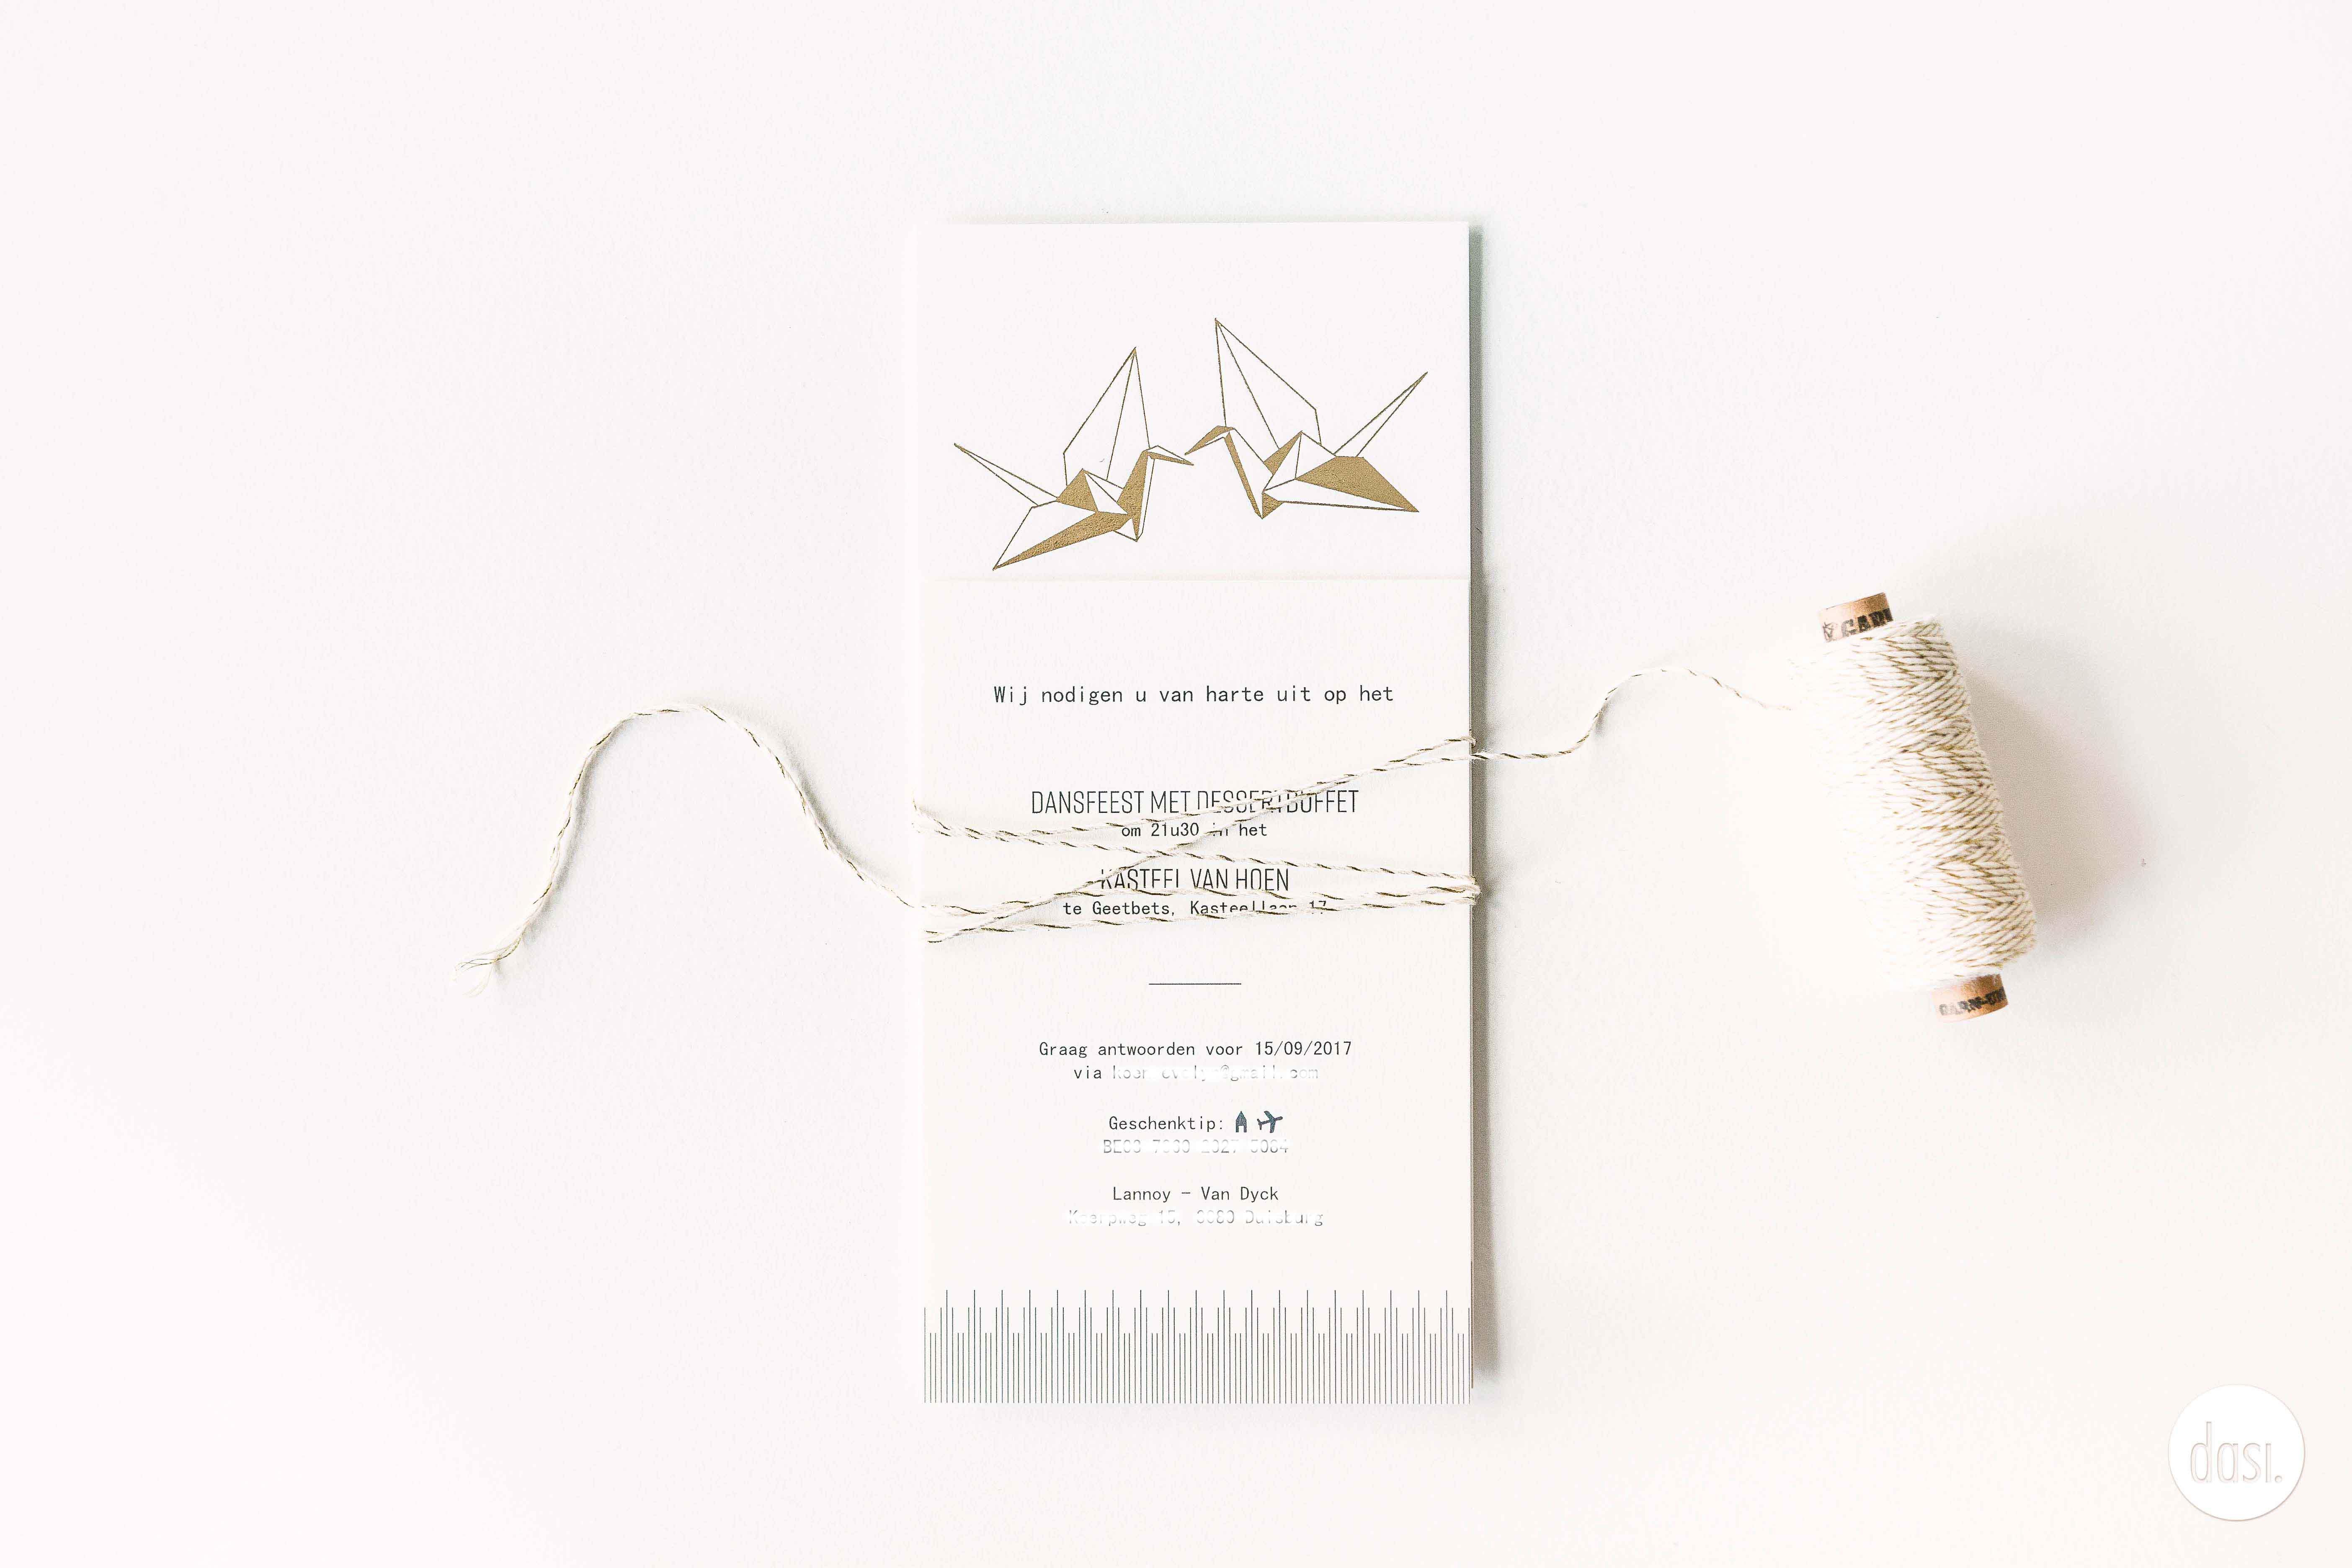 Uitnodiging letterpress kraanvogel